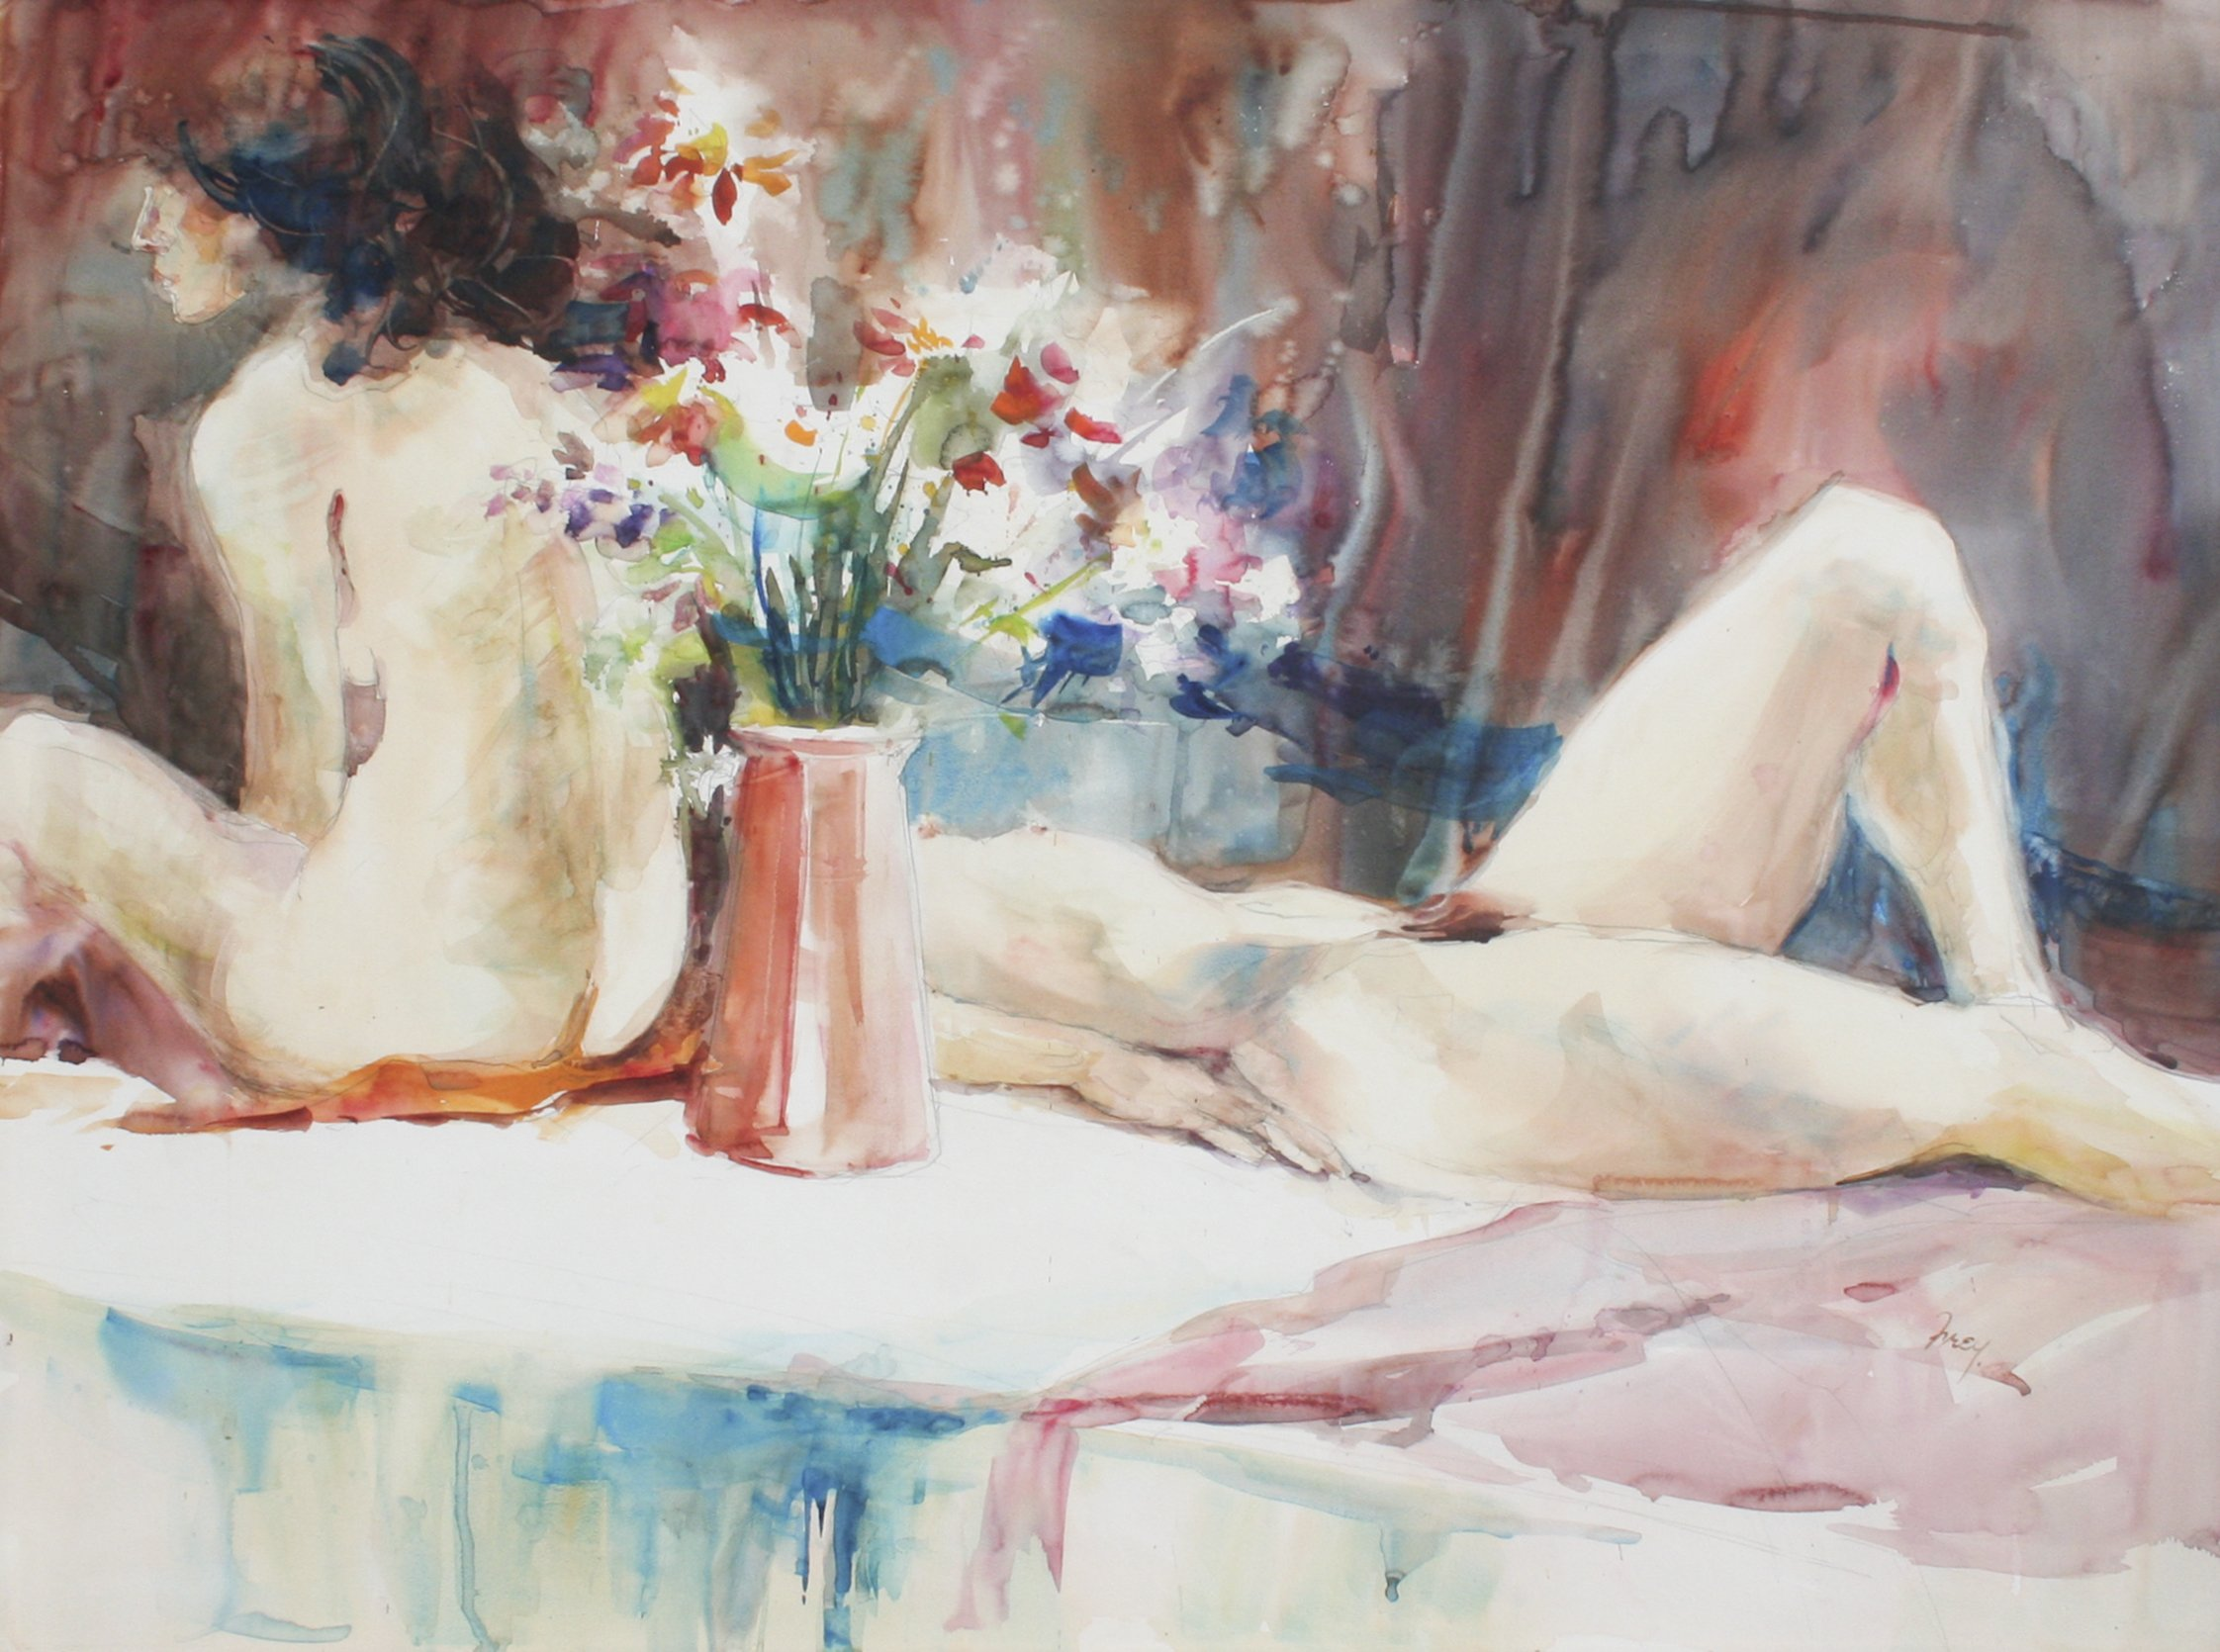 Frey Untitled, c. 1970